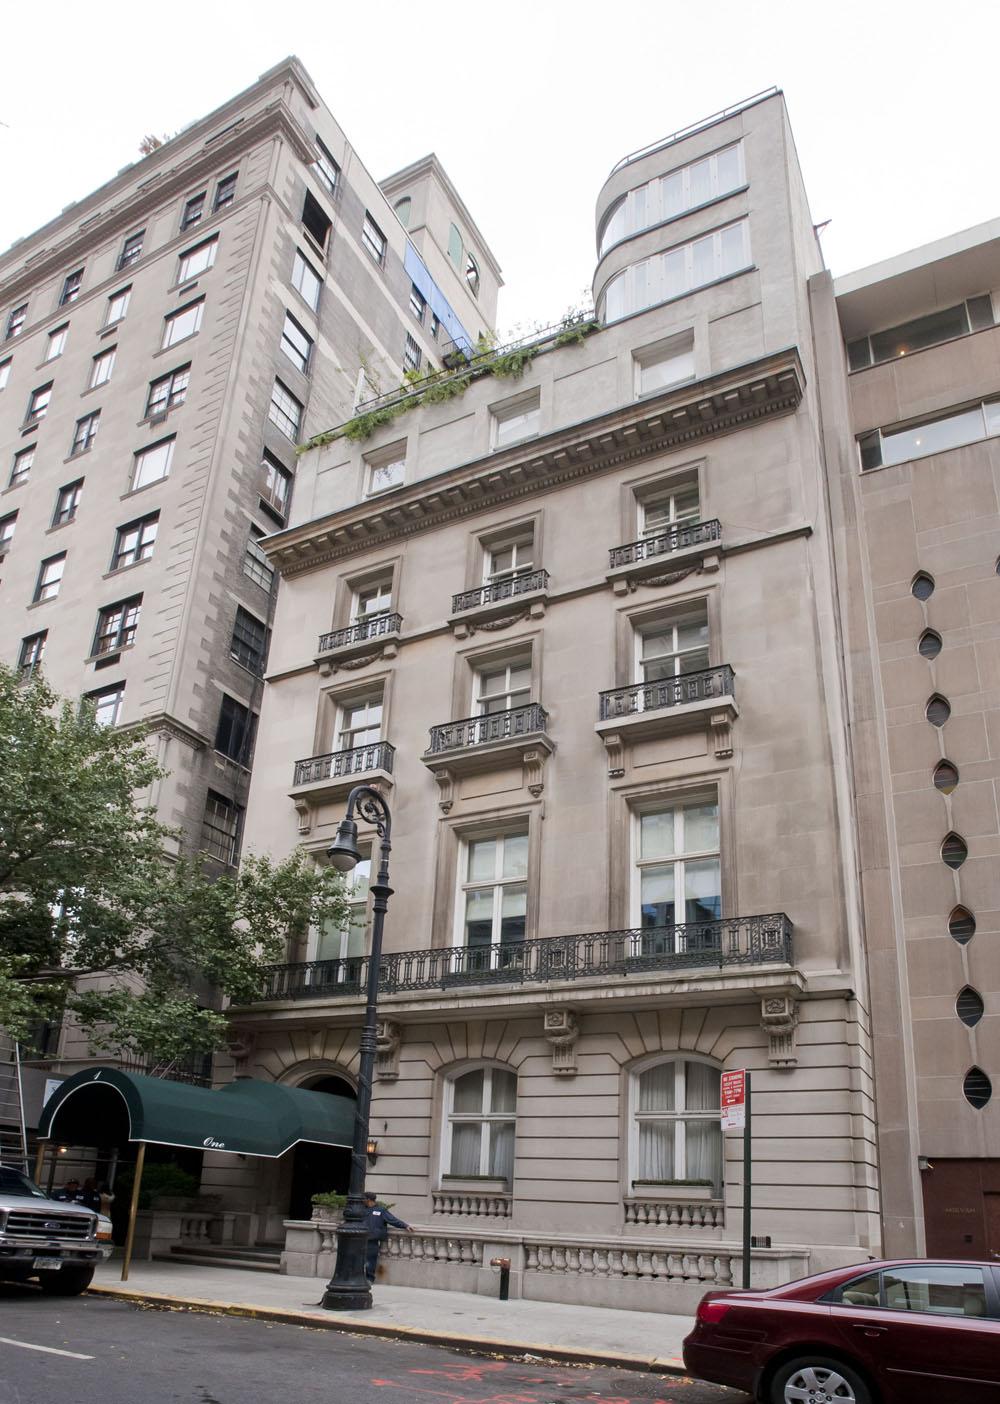 The 1903 John R. Drexel House -- No. 1 E. 62nd Street